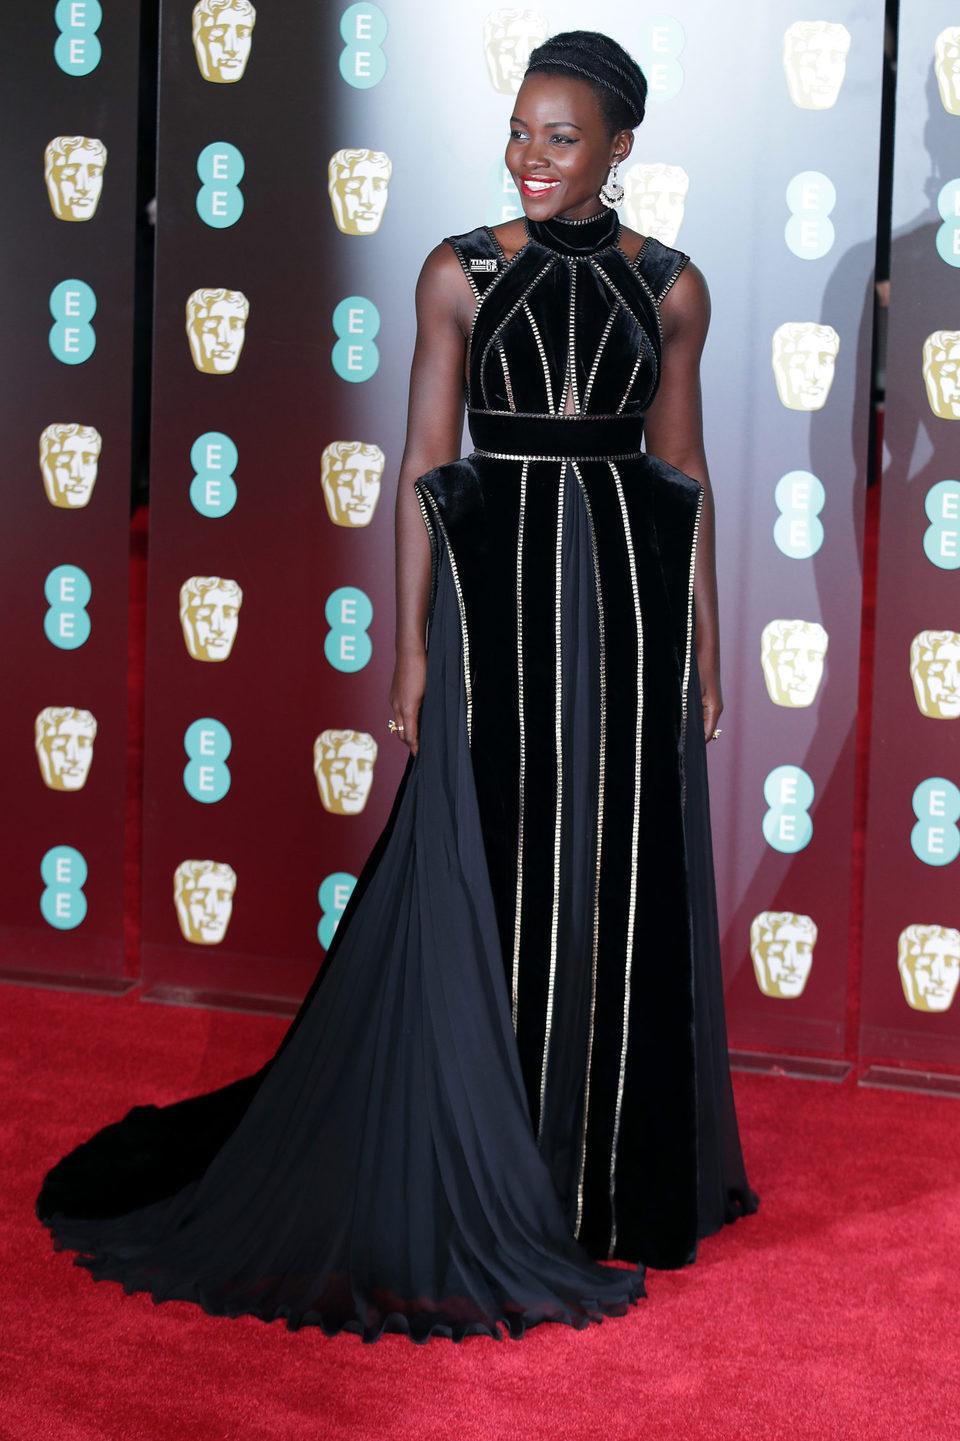 Lupita Nyong'o en la alfombra roja de los BAFTA 2018